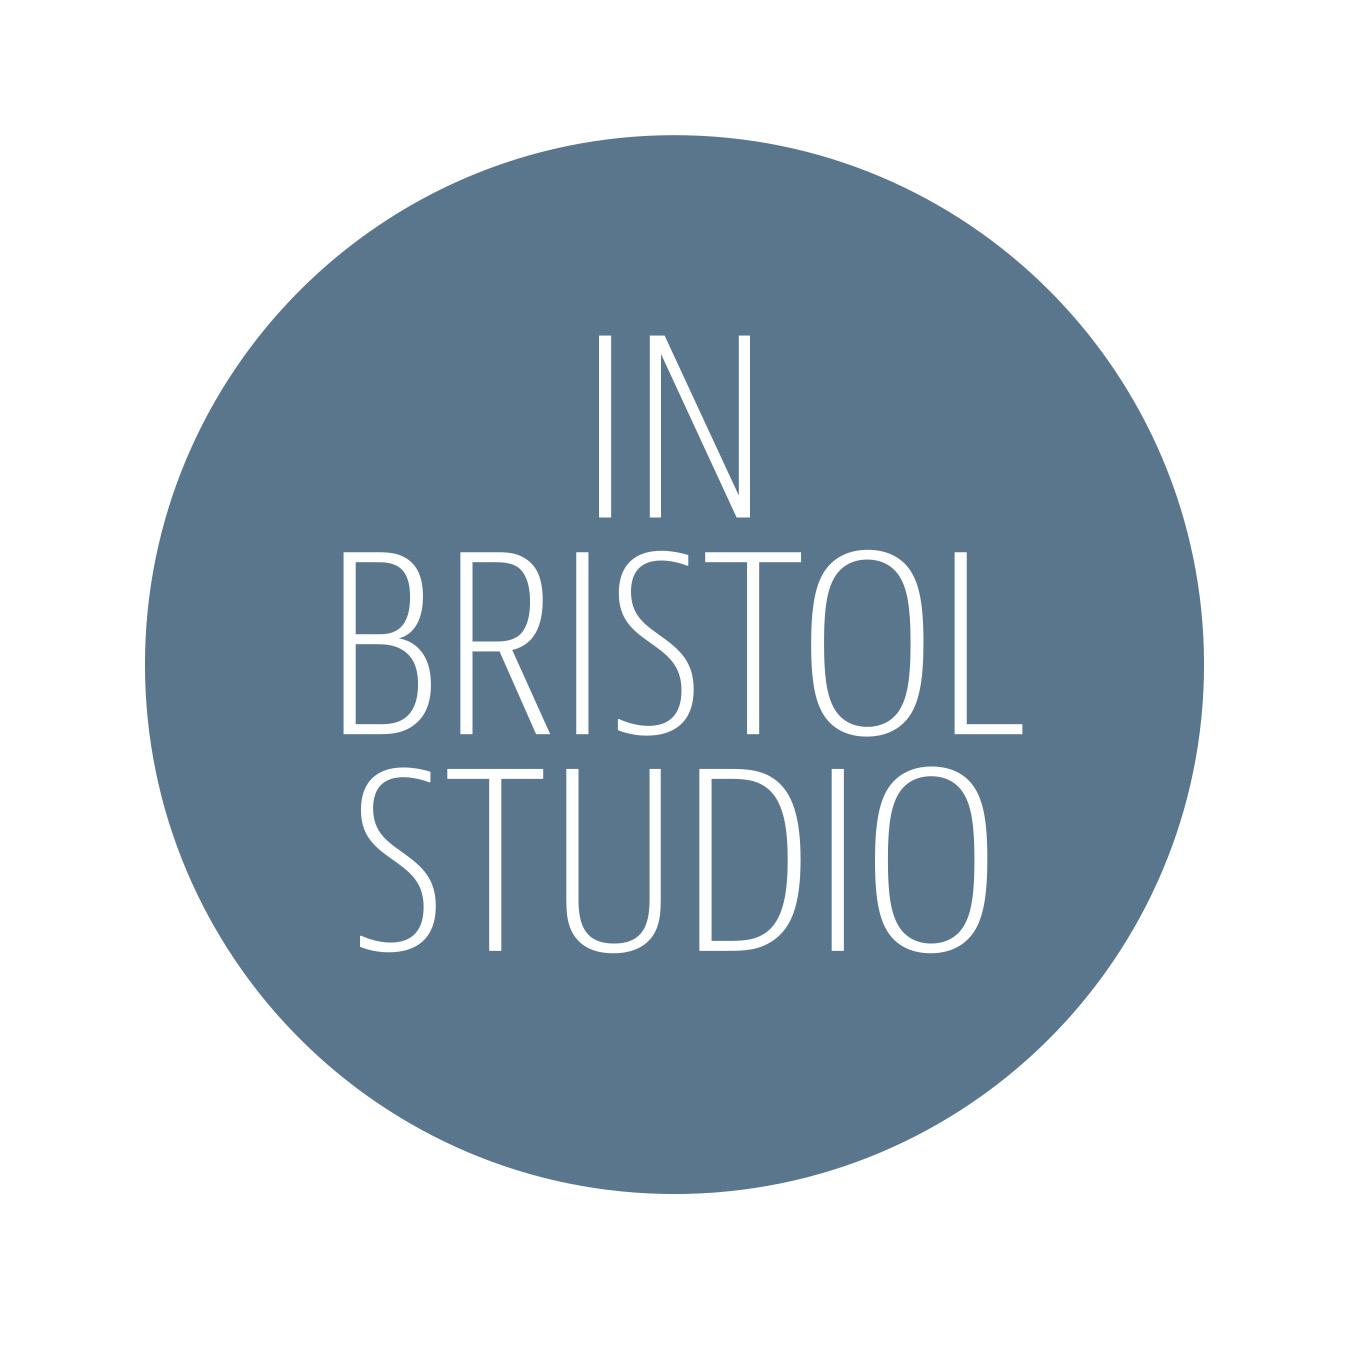 inbristol studio